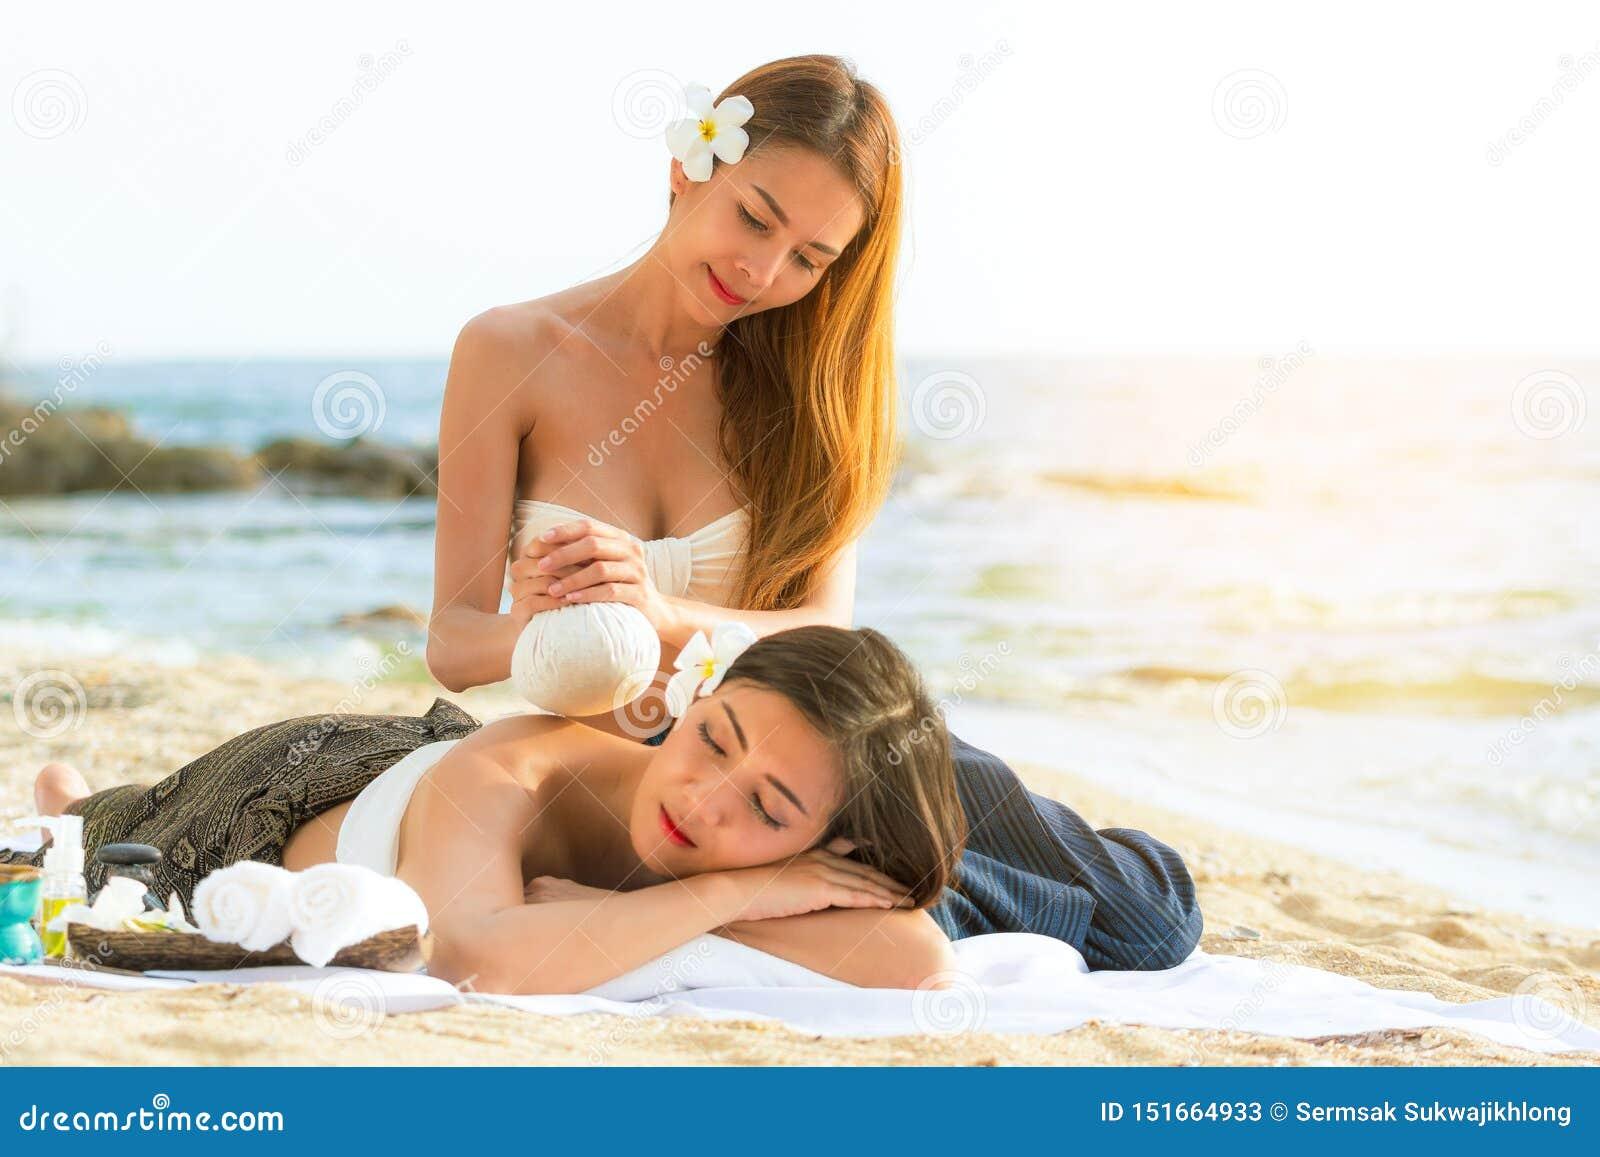 virginia oceana beach Asian near massage